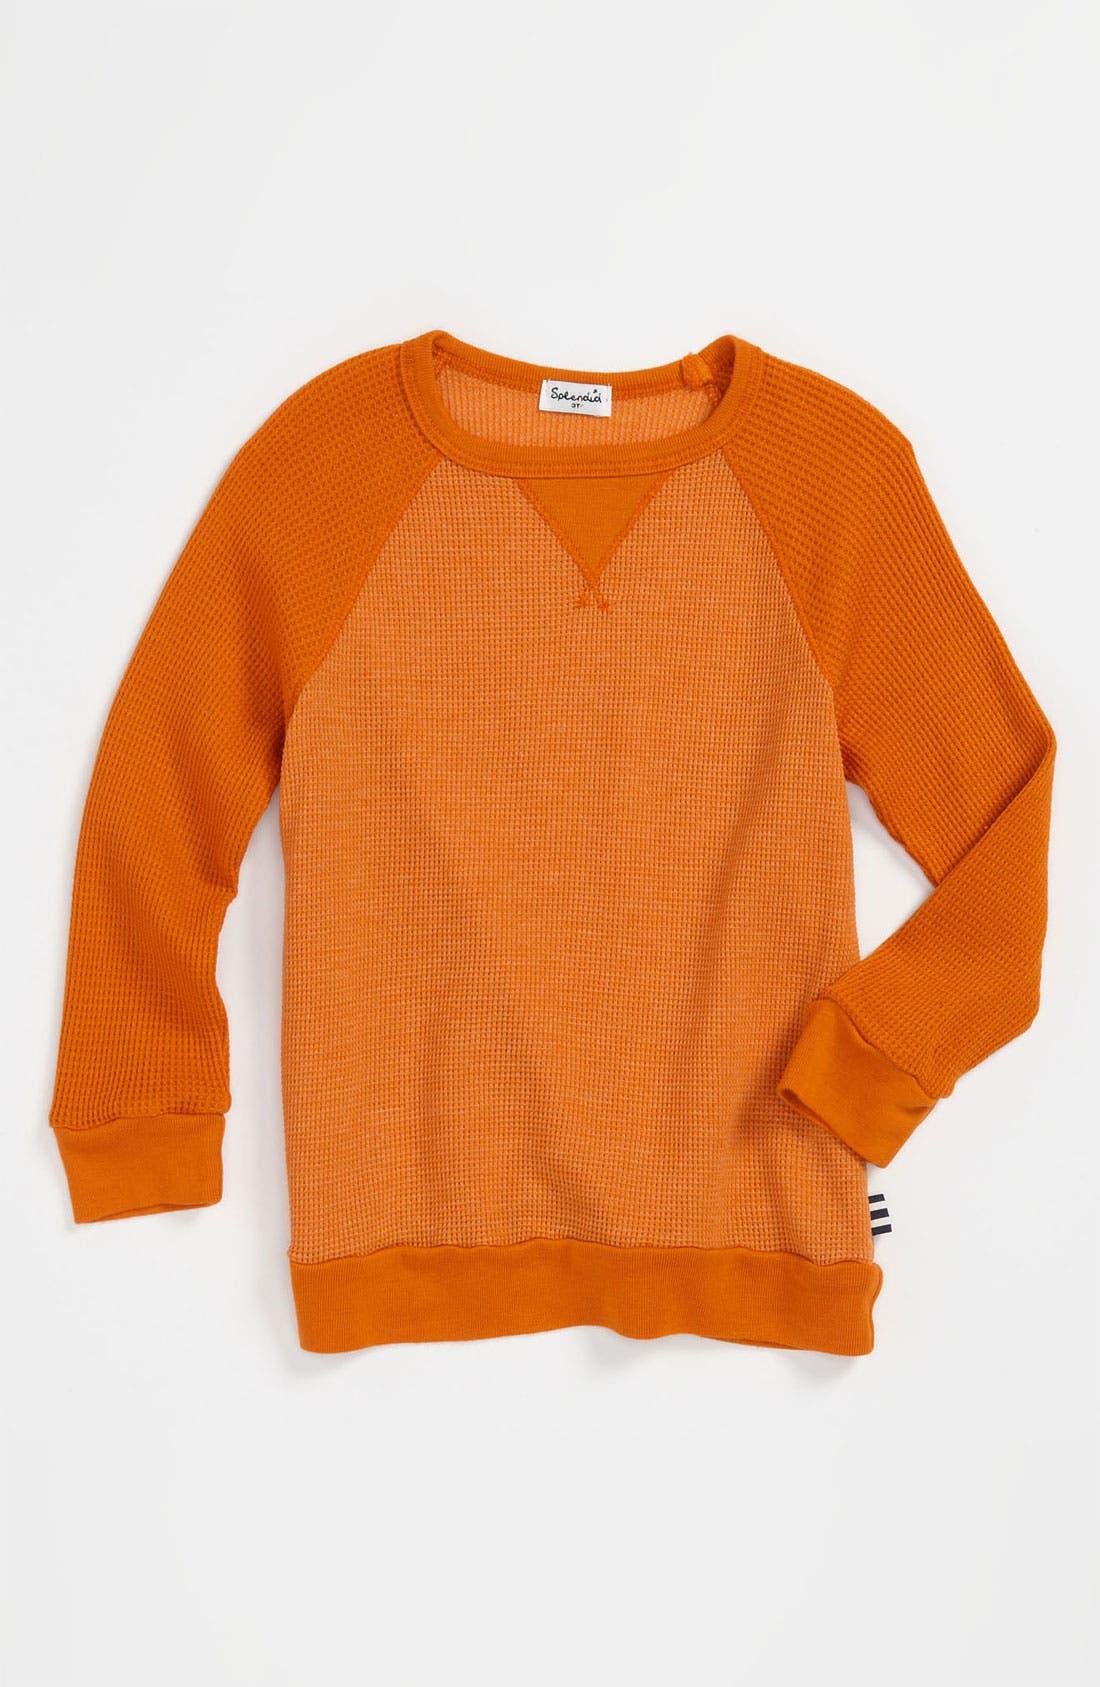 Main Image - Splendid 'Fletcher' Thermal T-Shirt (Toddler)